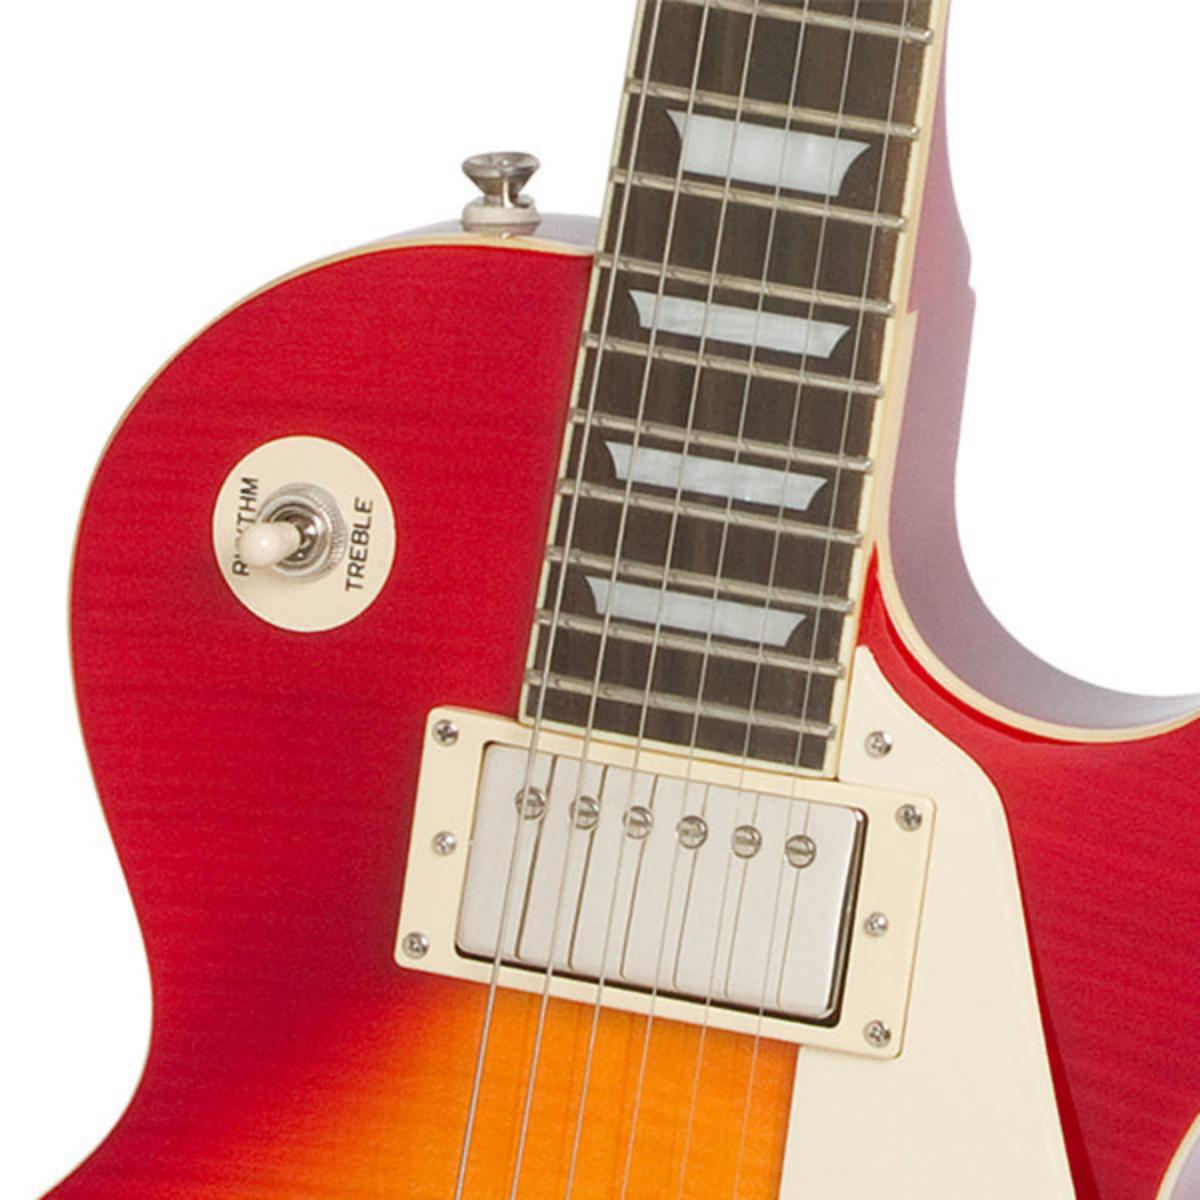 epiphone les paul standard plustop pro guitare electrique heritage cherry sunburst bo te. Black Bedroom Furniture Sets. Home Design Ideas